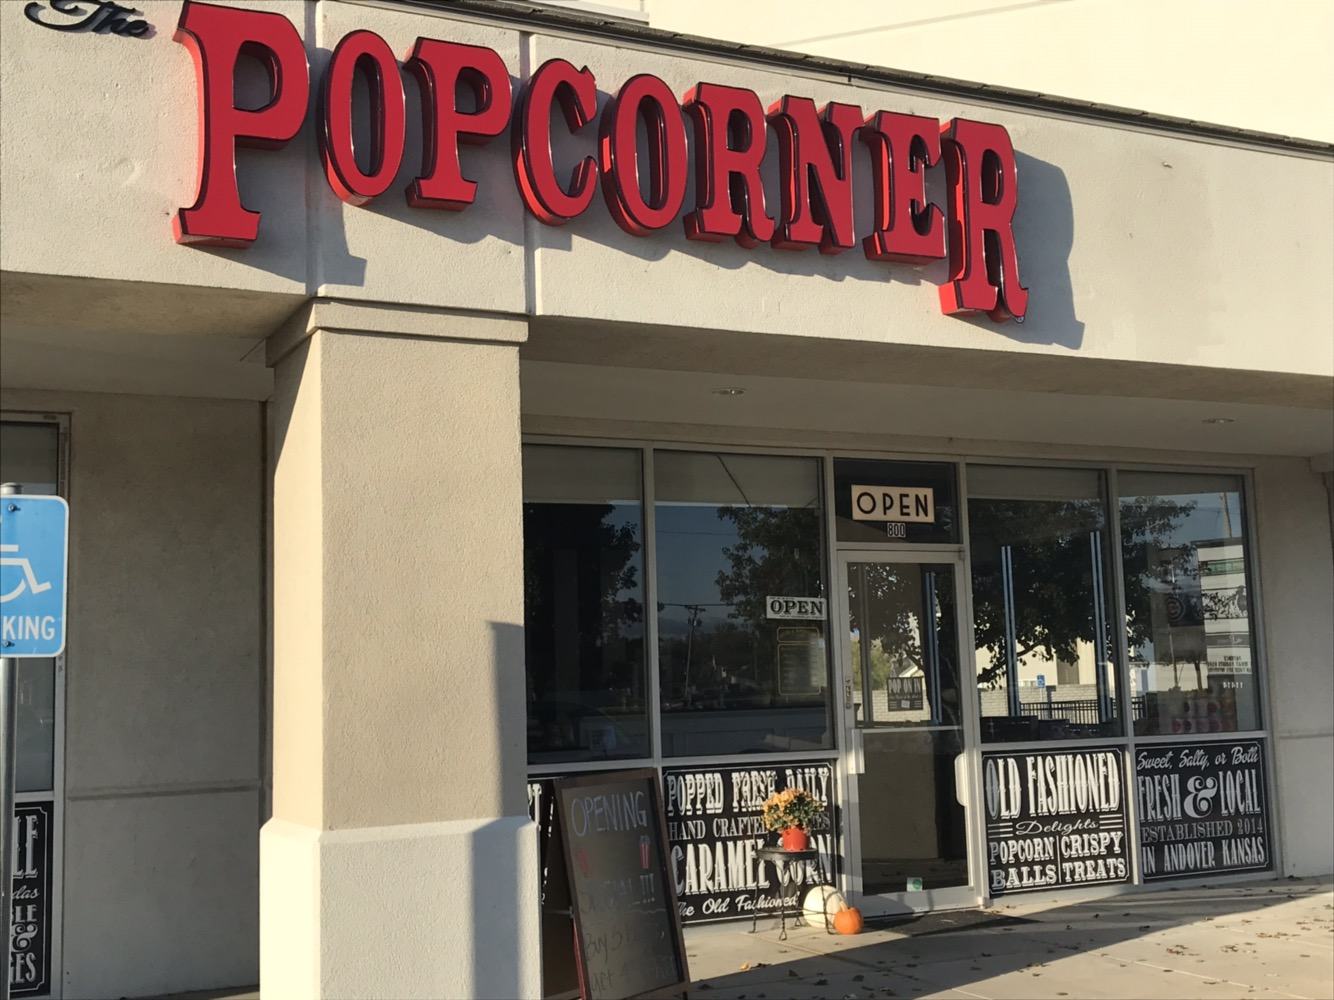 The Popcorner West